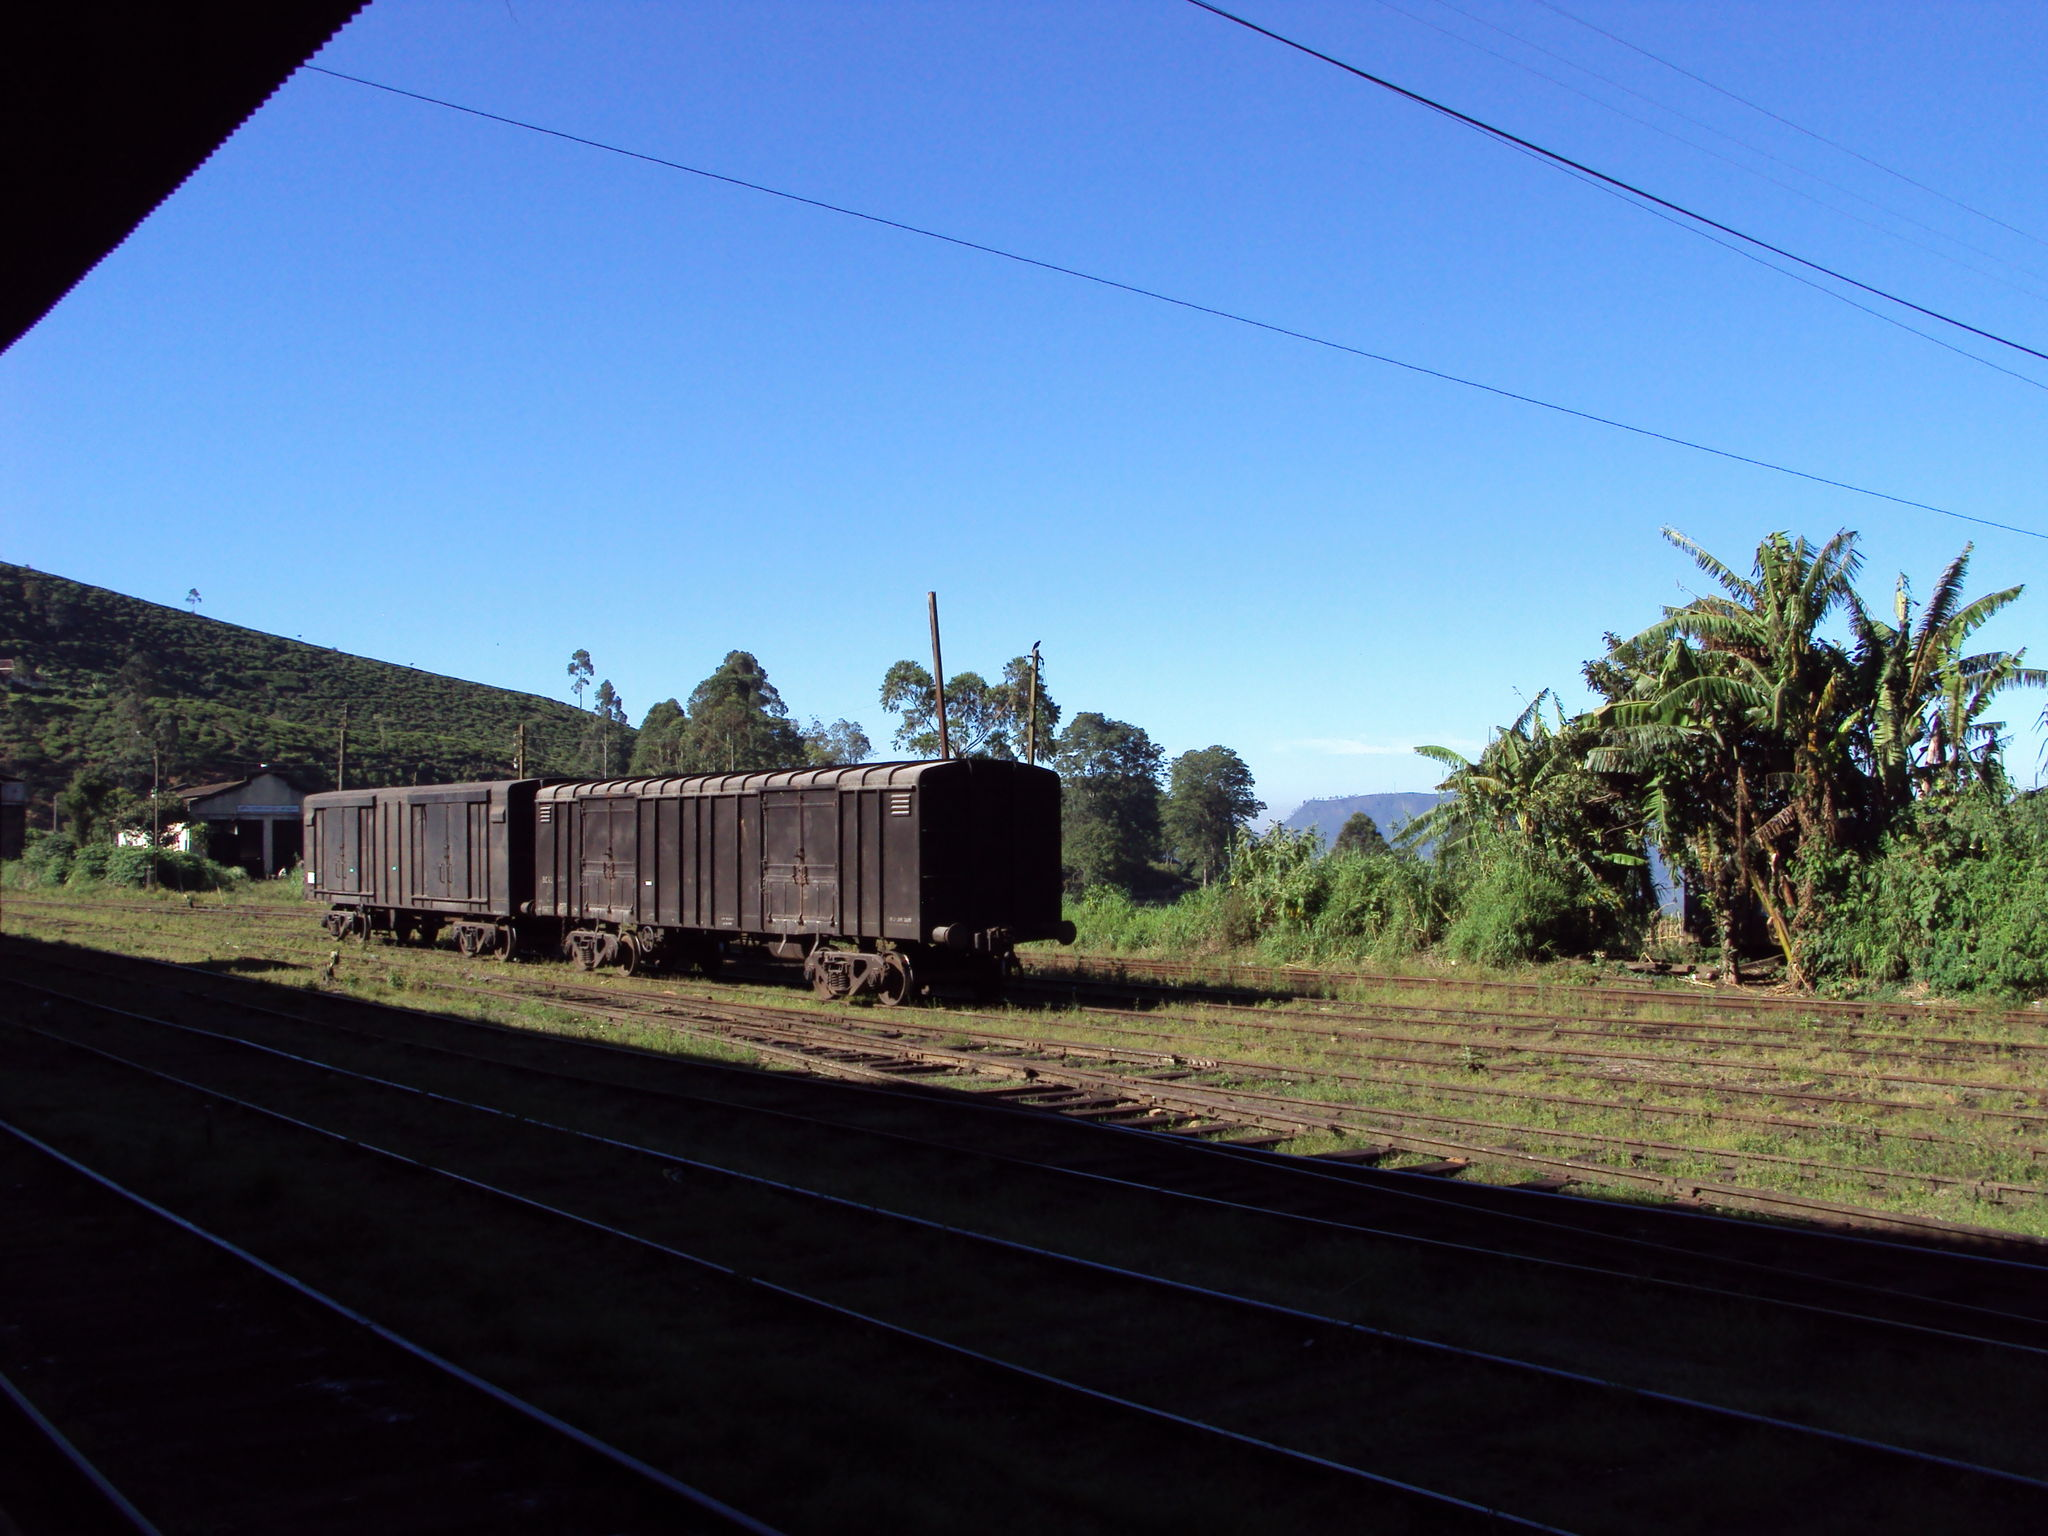 Nanu Oya (Sri Lanka) wagons